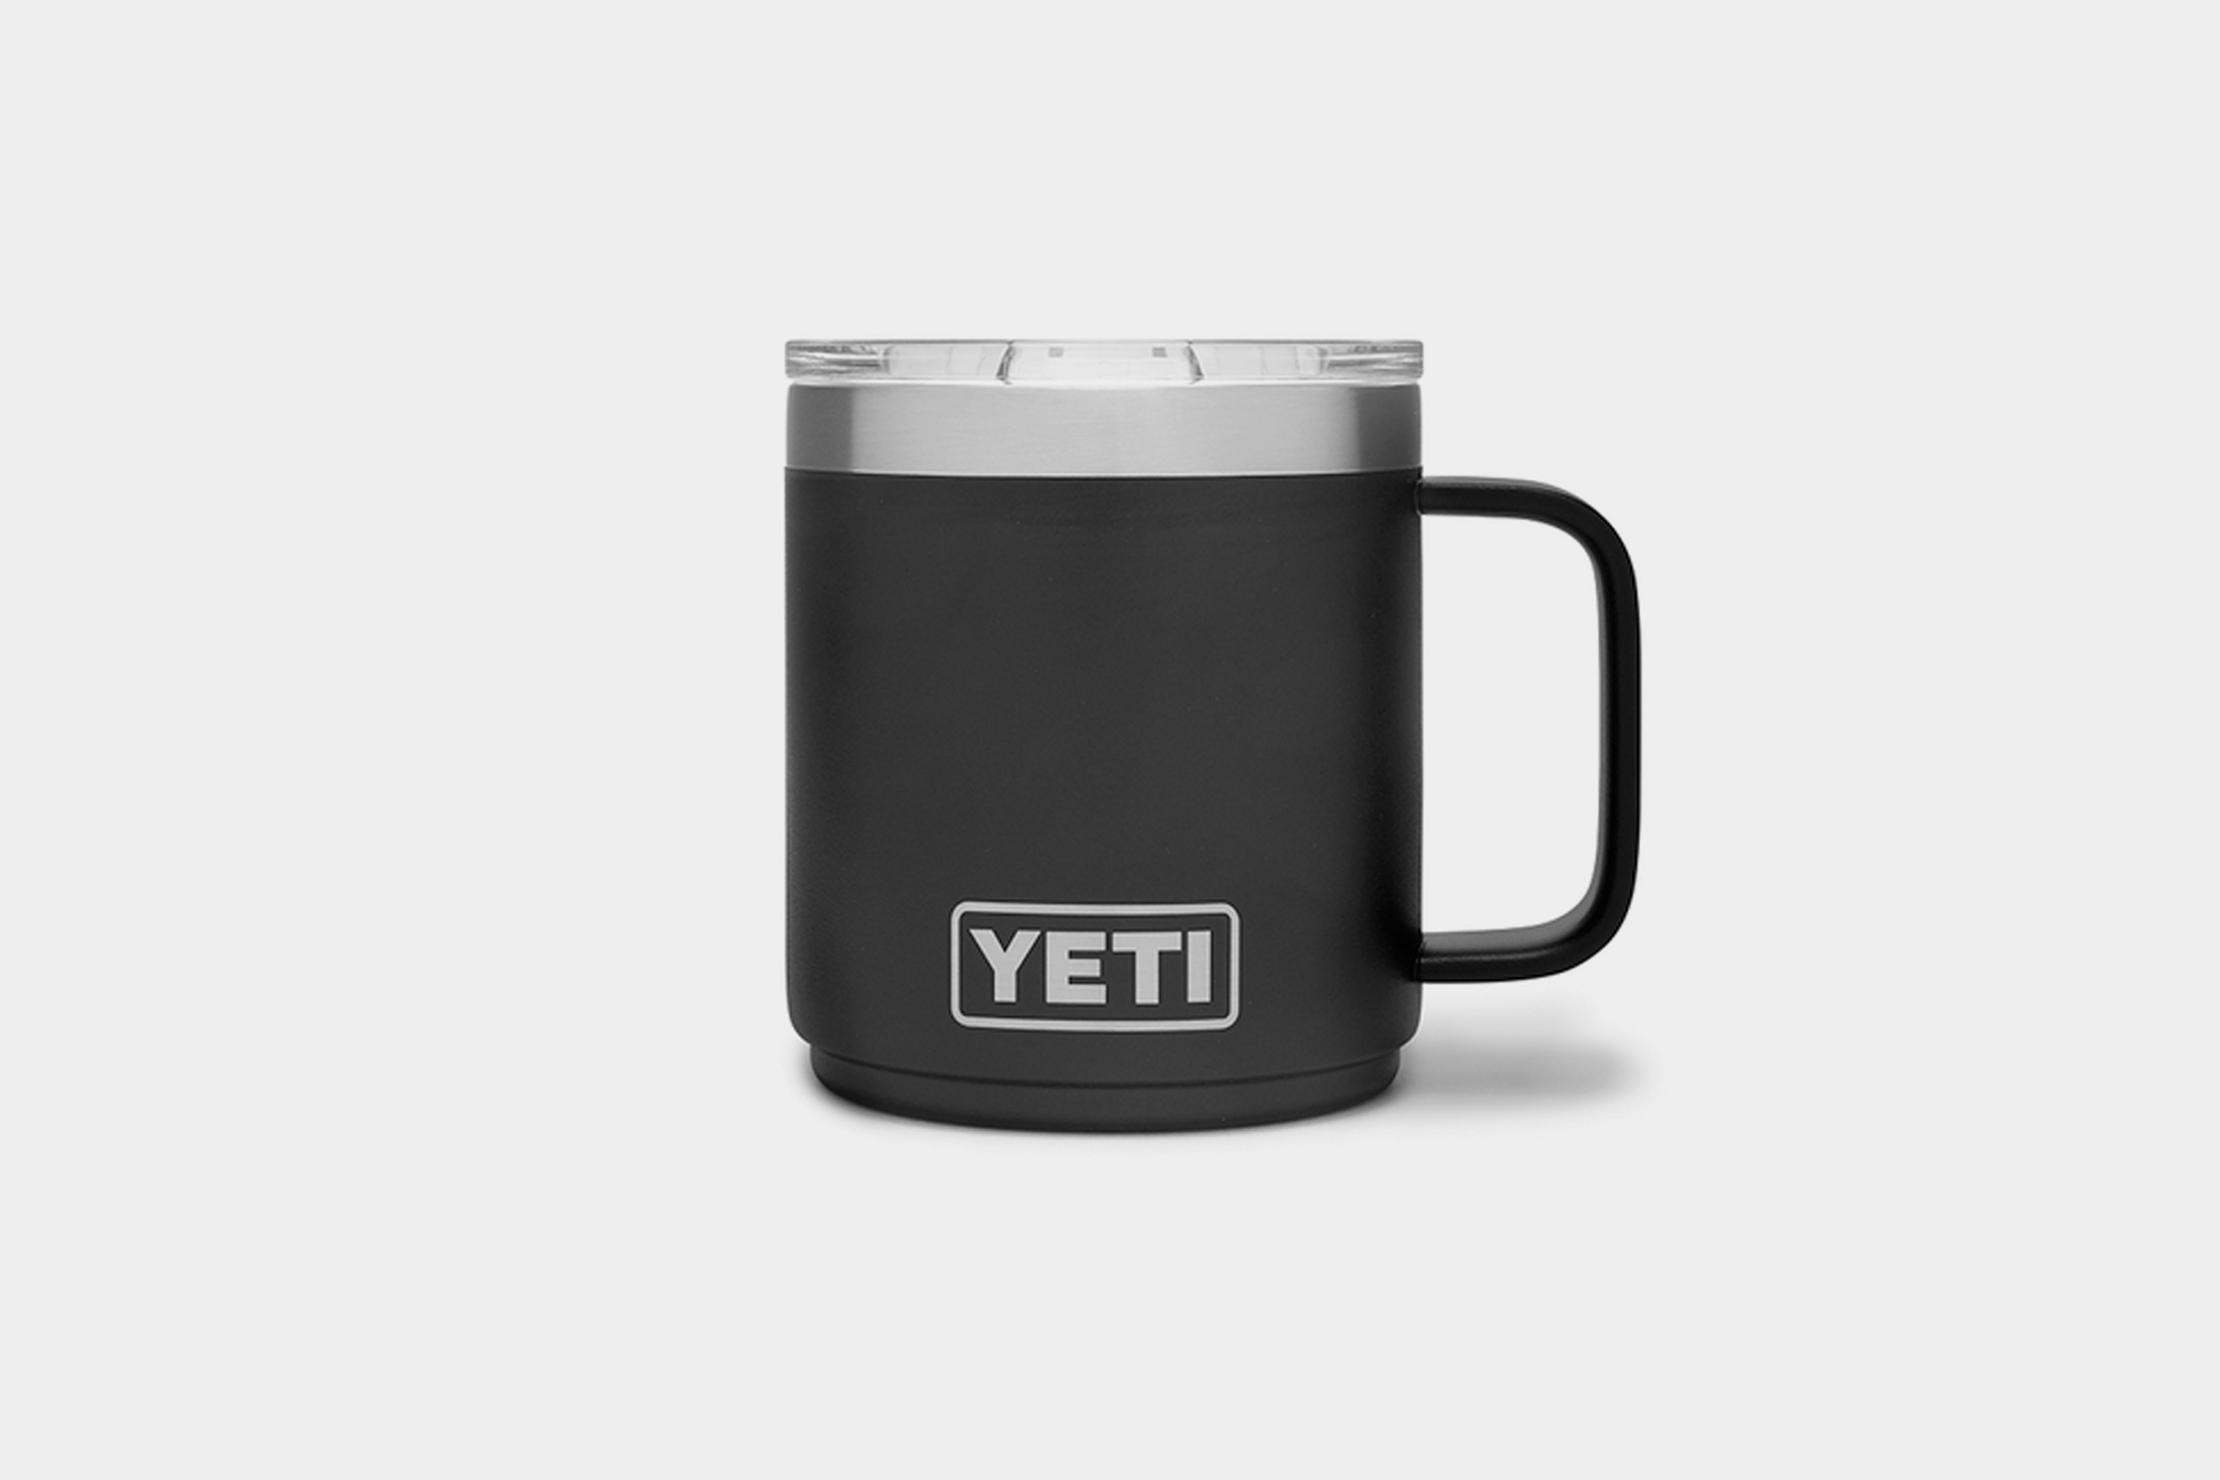 Yeti Rambler 10oz Stackable Mug Pack Hacker